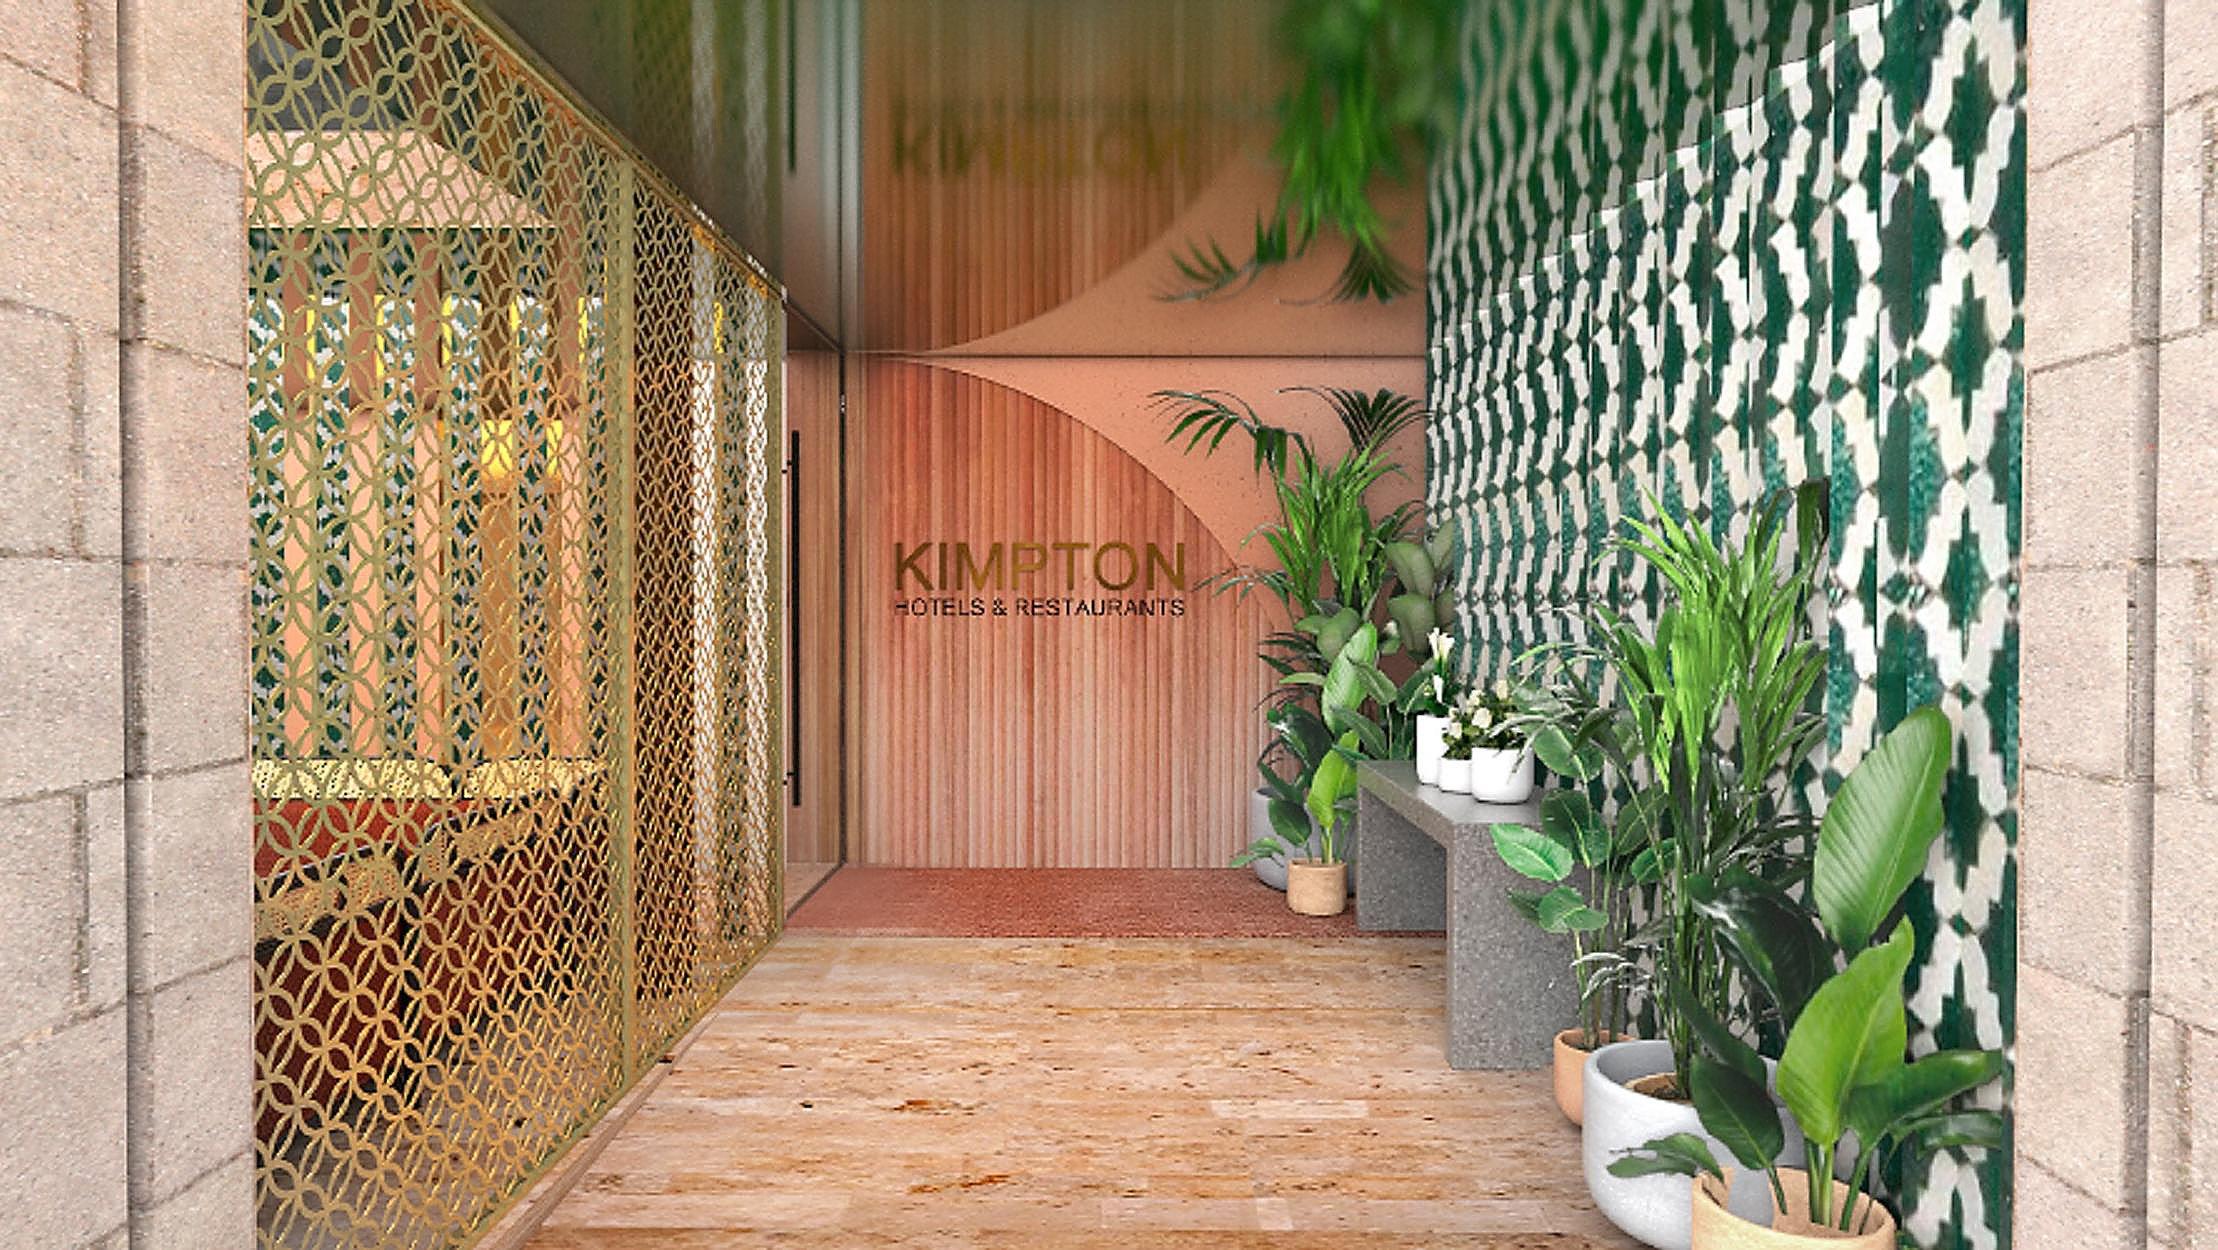 Kimpton Vividora Hotel In Barcelona City Centre Kimpton Hotels